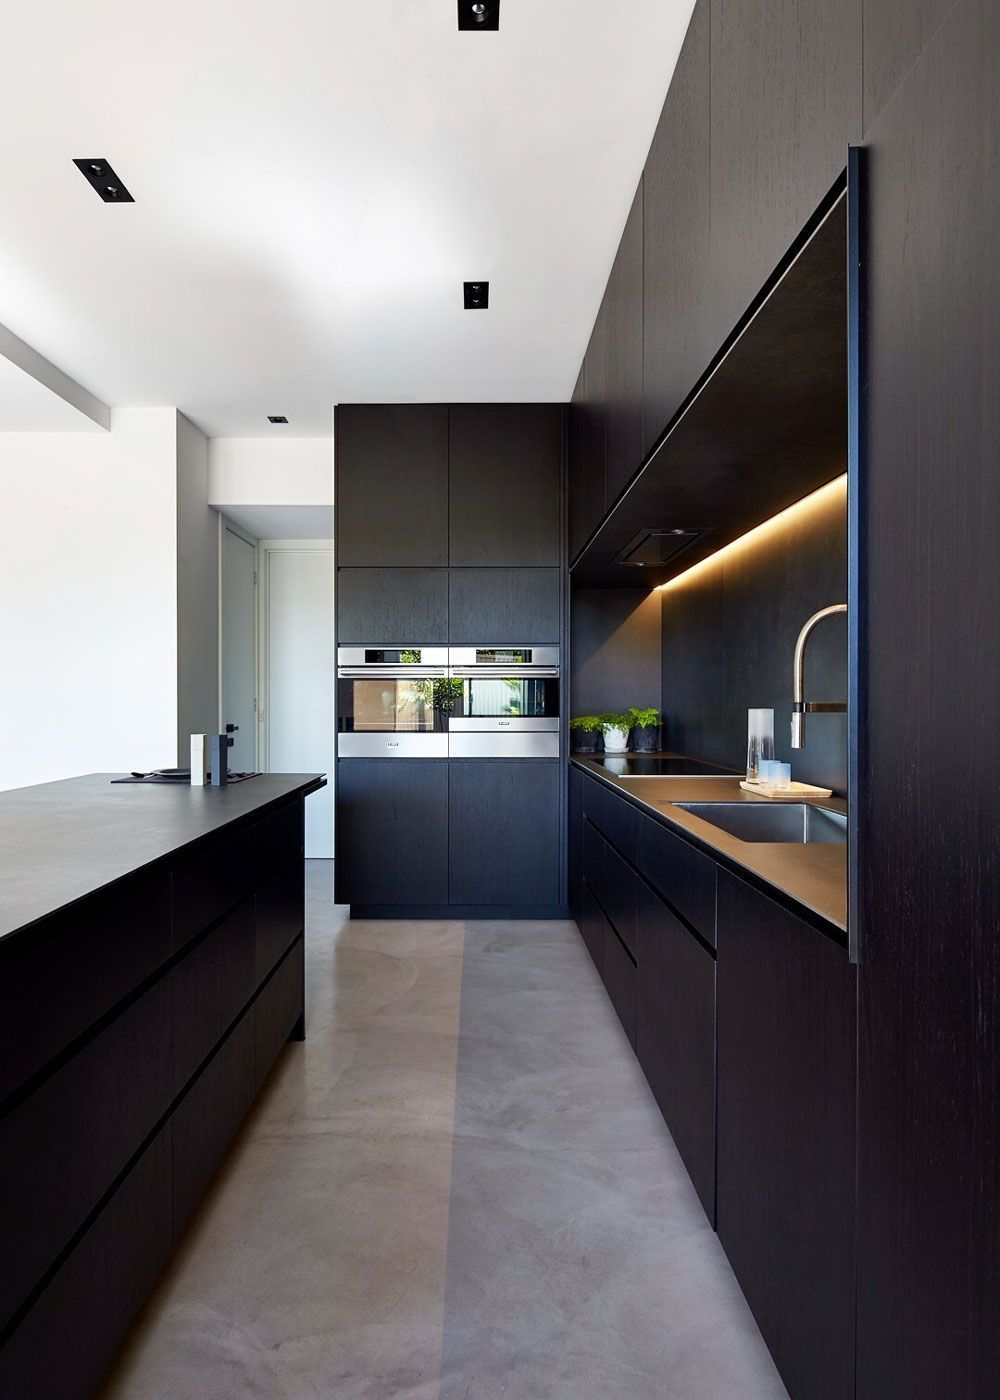 Billig fugenloser bodenbelag | Küche | Pinterest | Bodenbelag, Küche ...